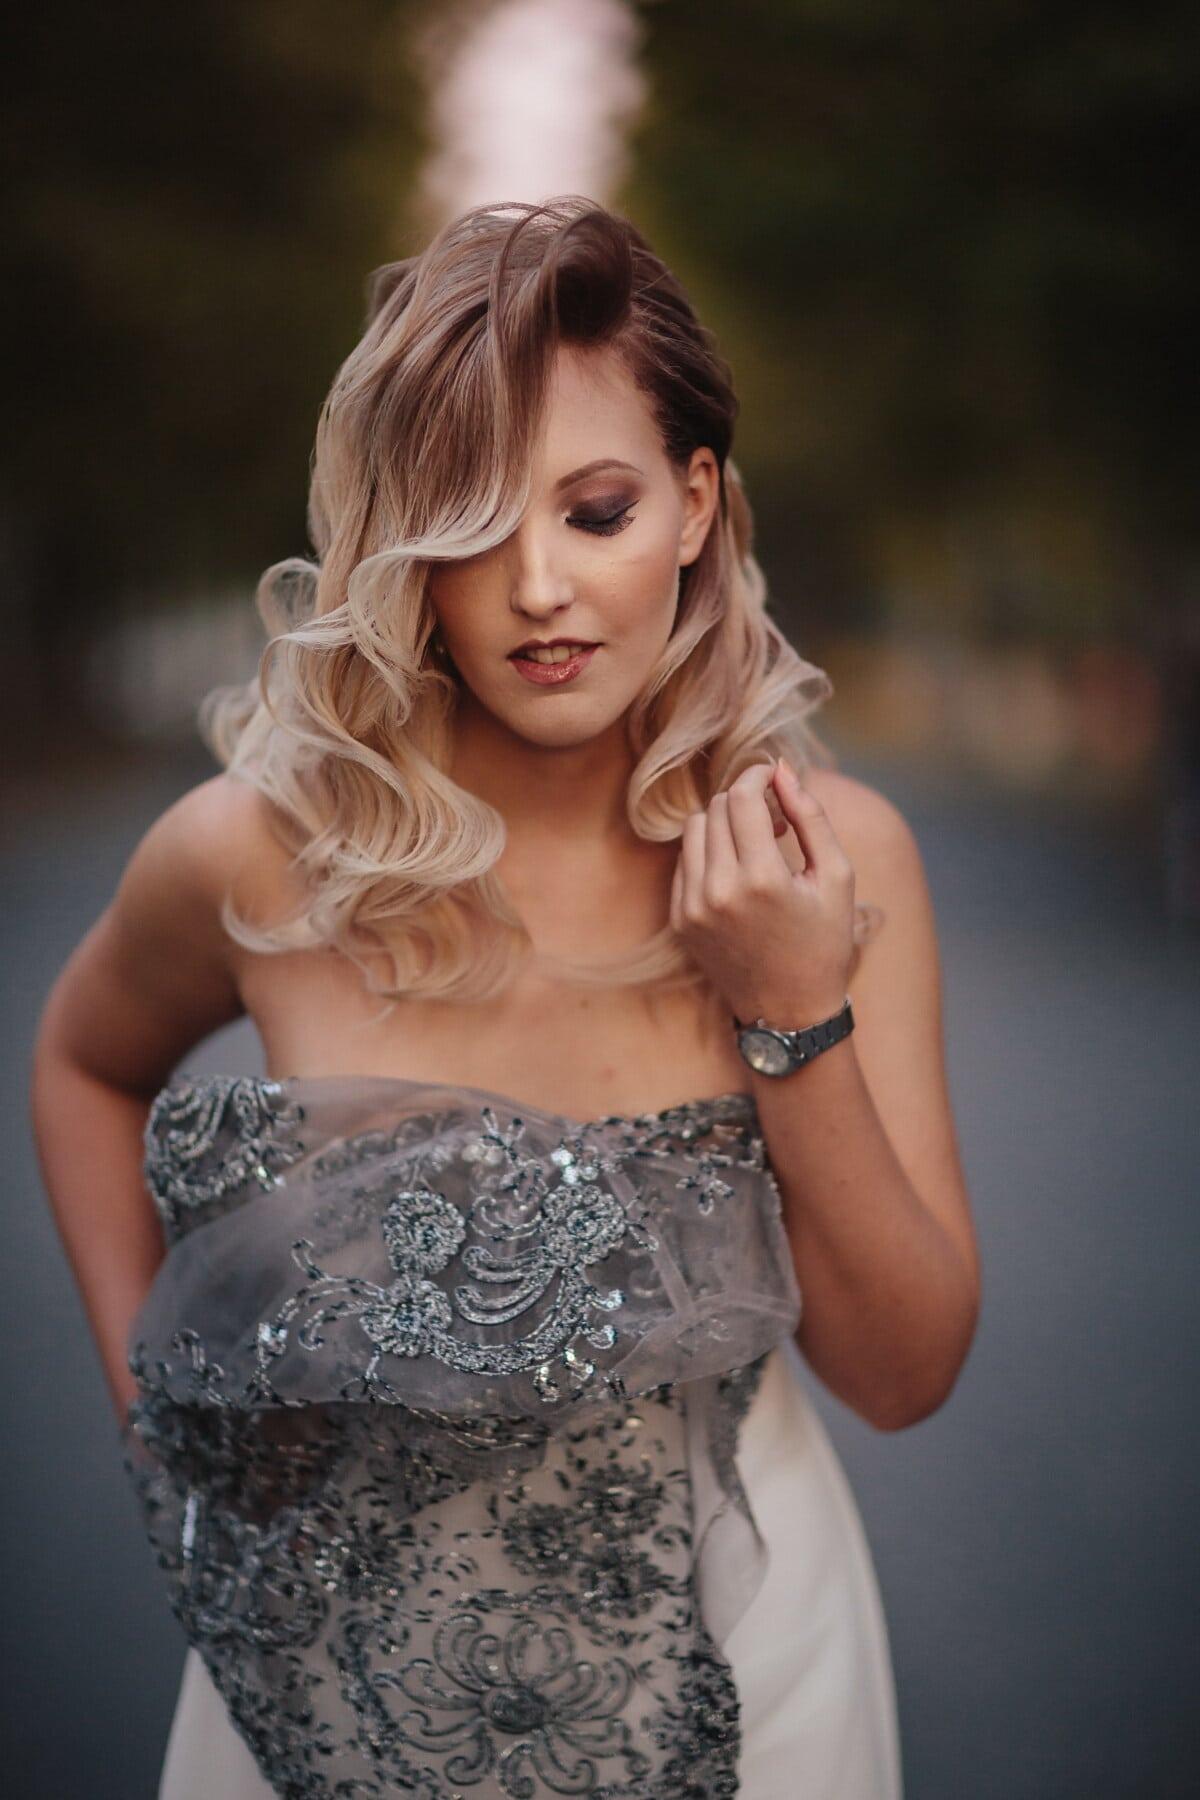 teenager, gorgeous, pretty girl, blonde hair, slim, body, model, glamour, portrait, hair